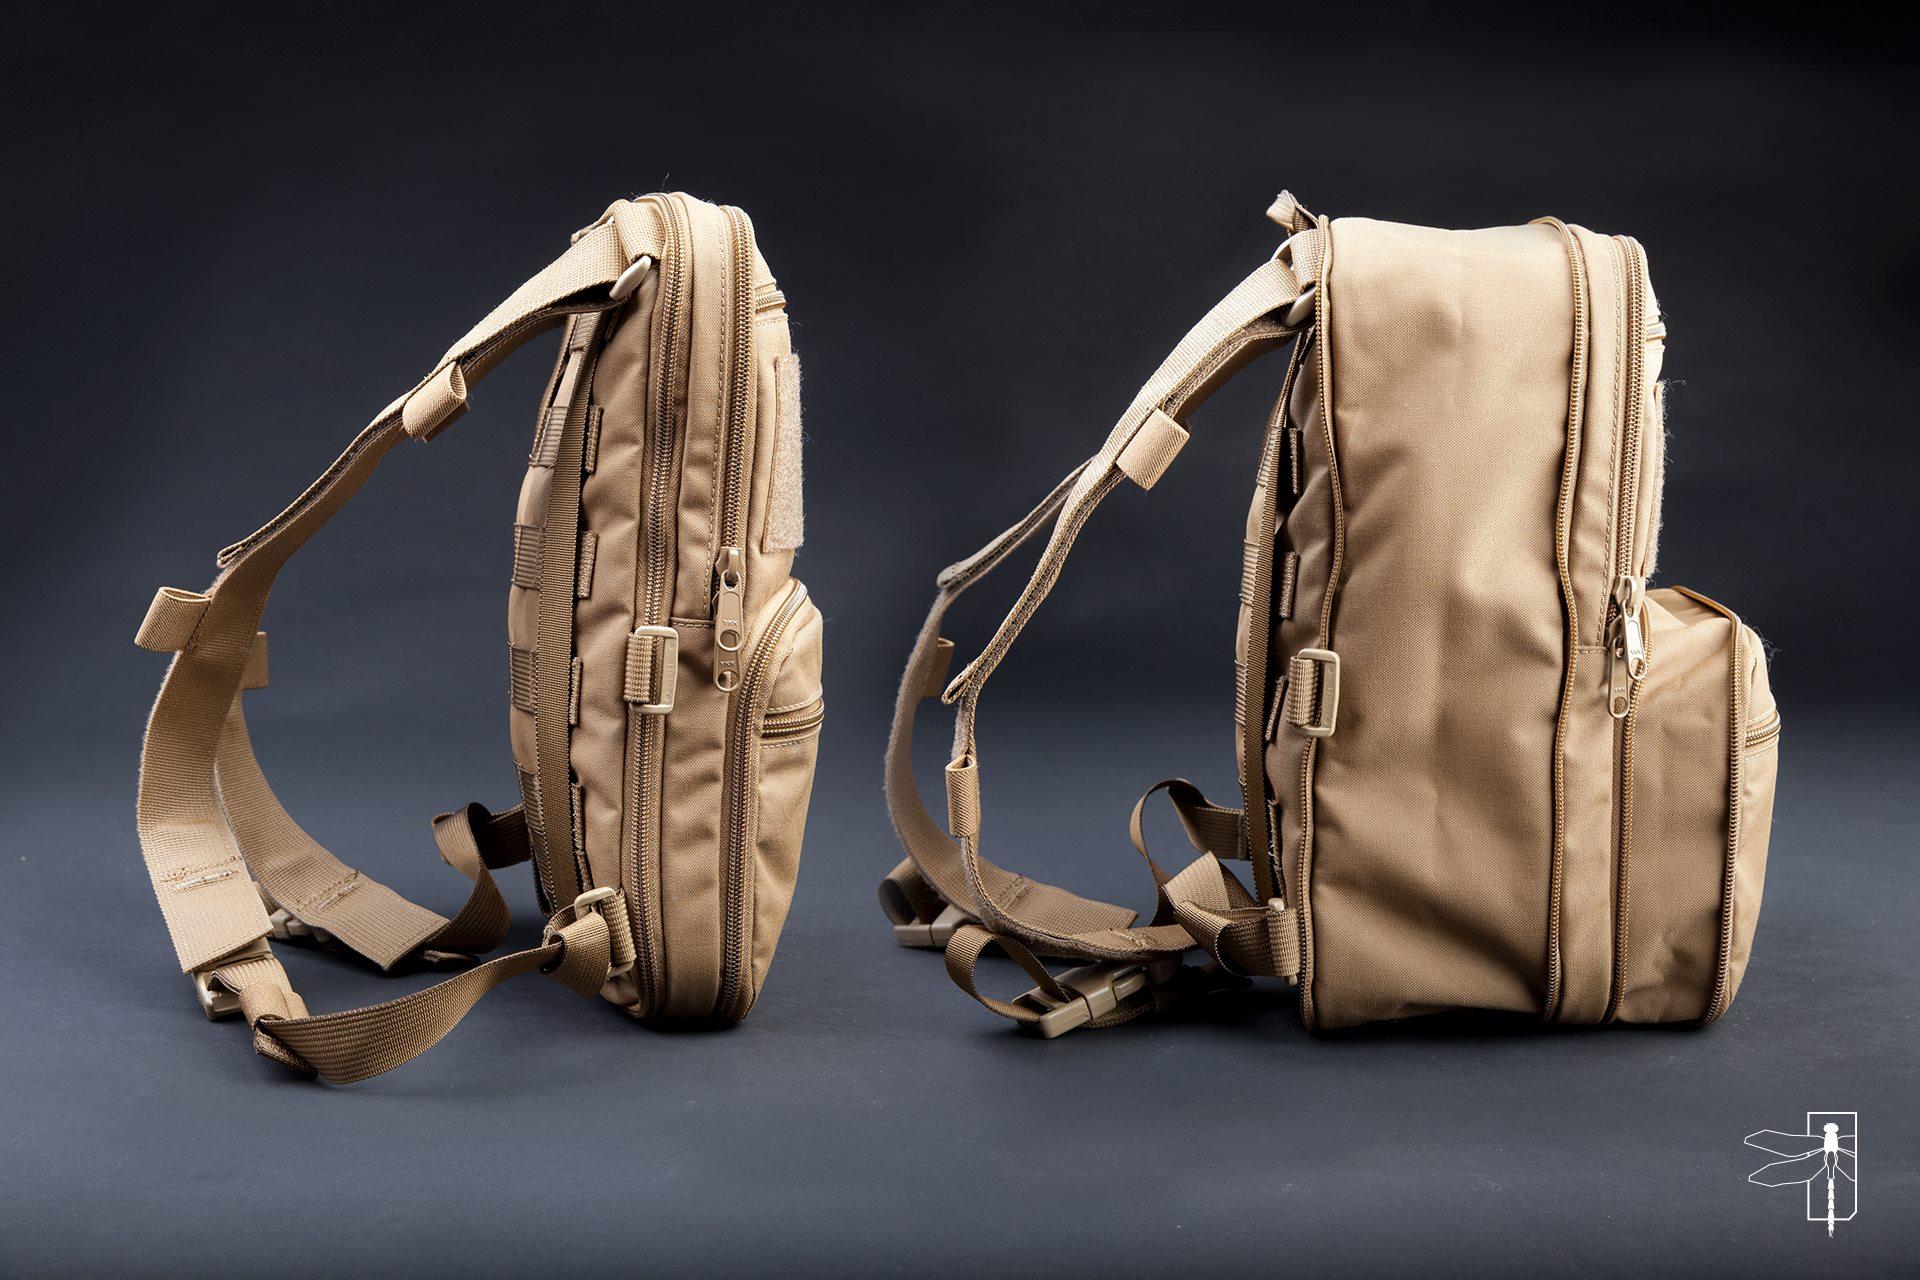 Haley Strategic Flatpack Expandable Compact Assault Pack